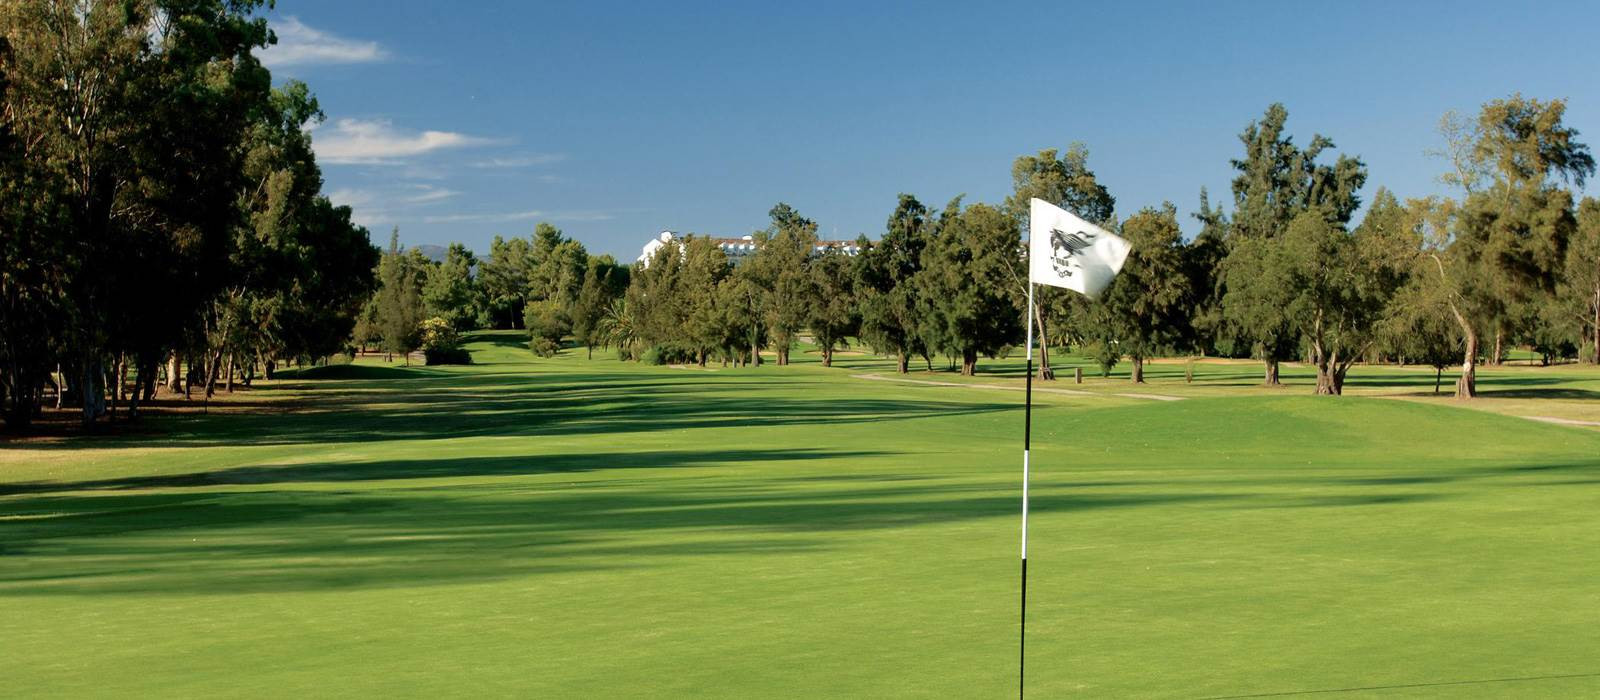 Penina_Golf_17th_Hole.jpg